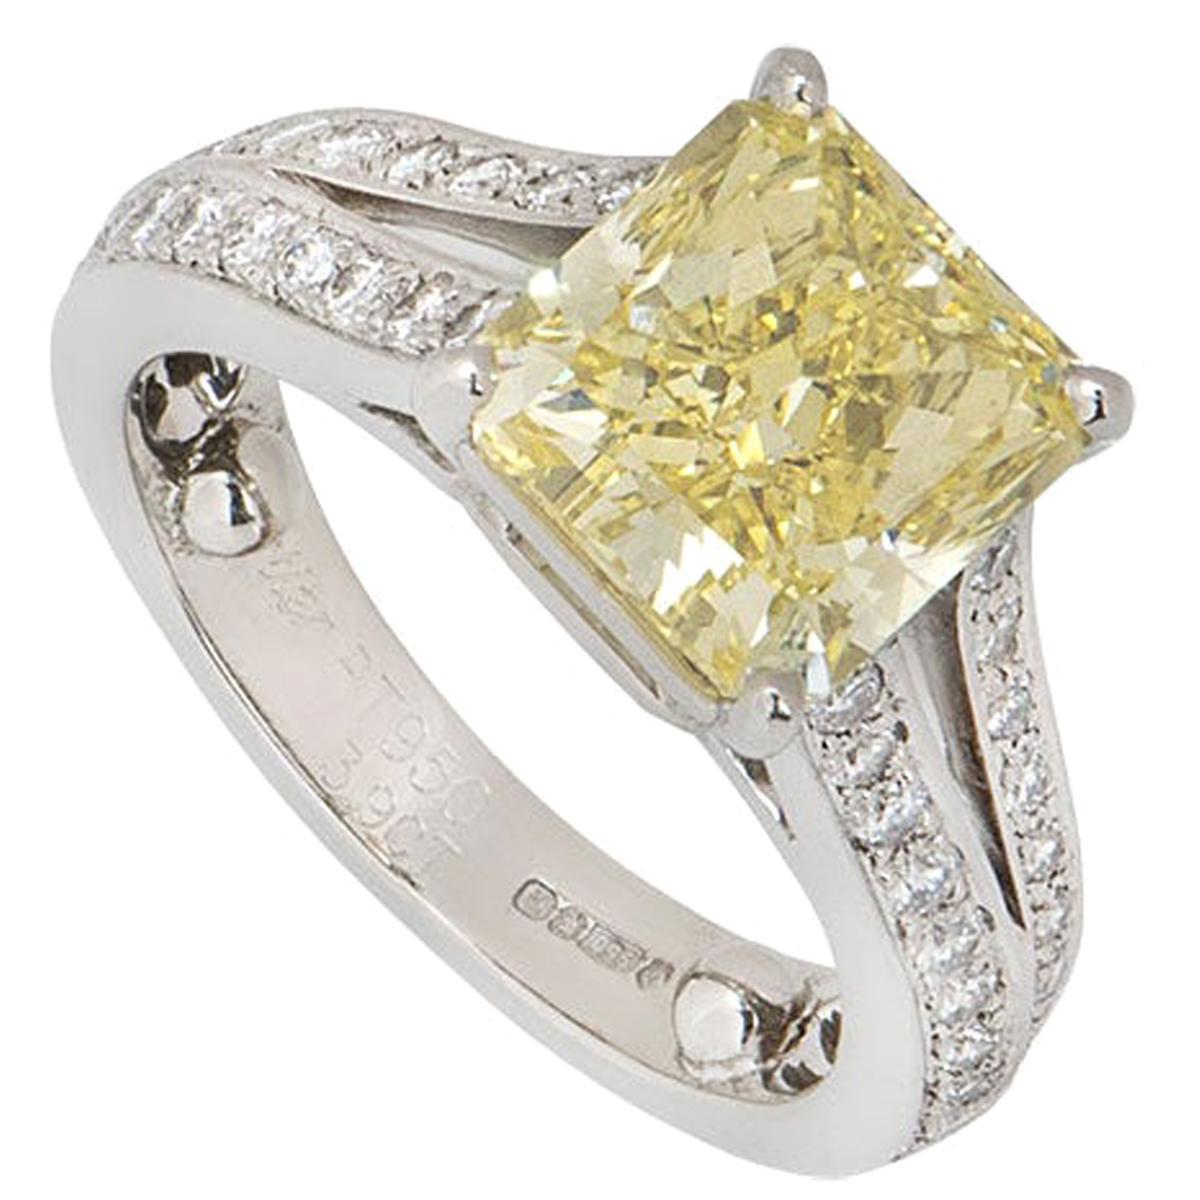 Cartier Platinum Fancy Intense Yellow Diamond Adele Engagement Ring 3.90 Carat